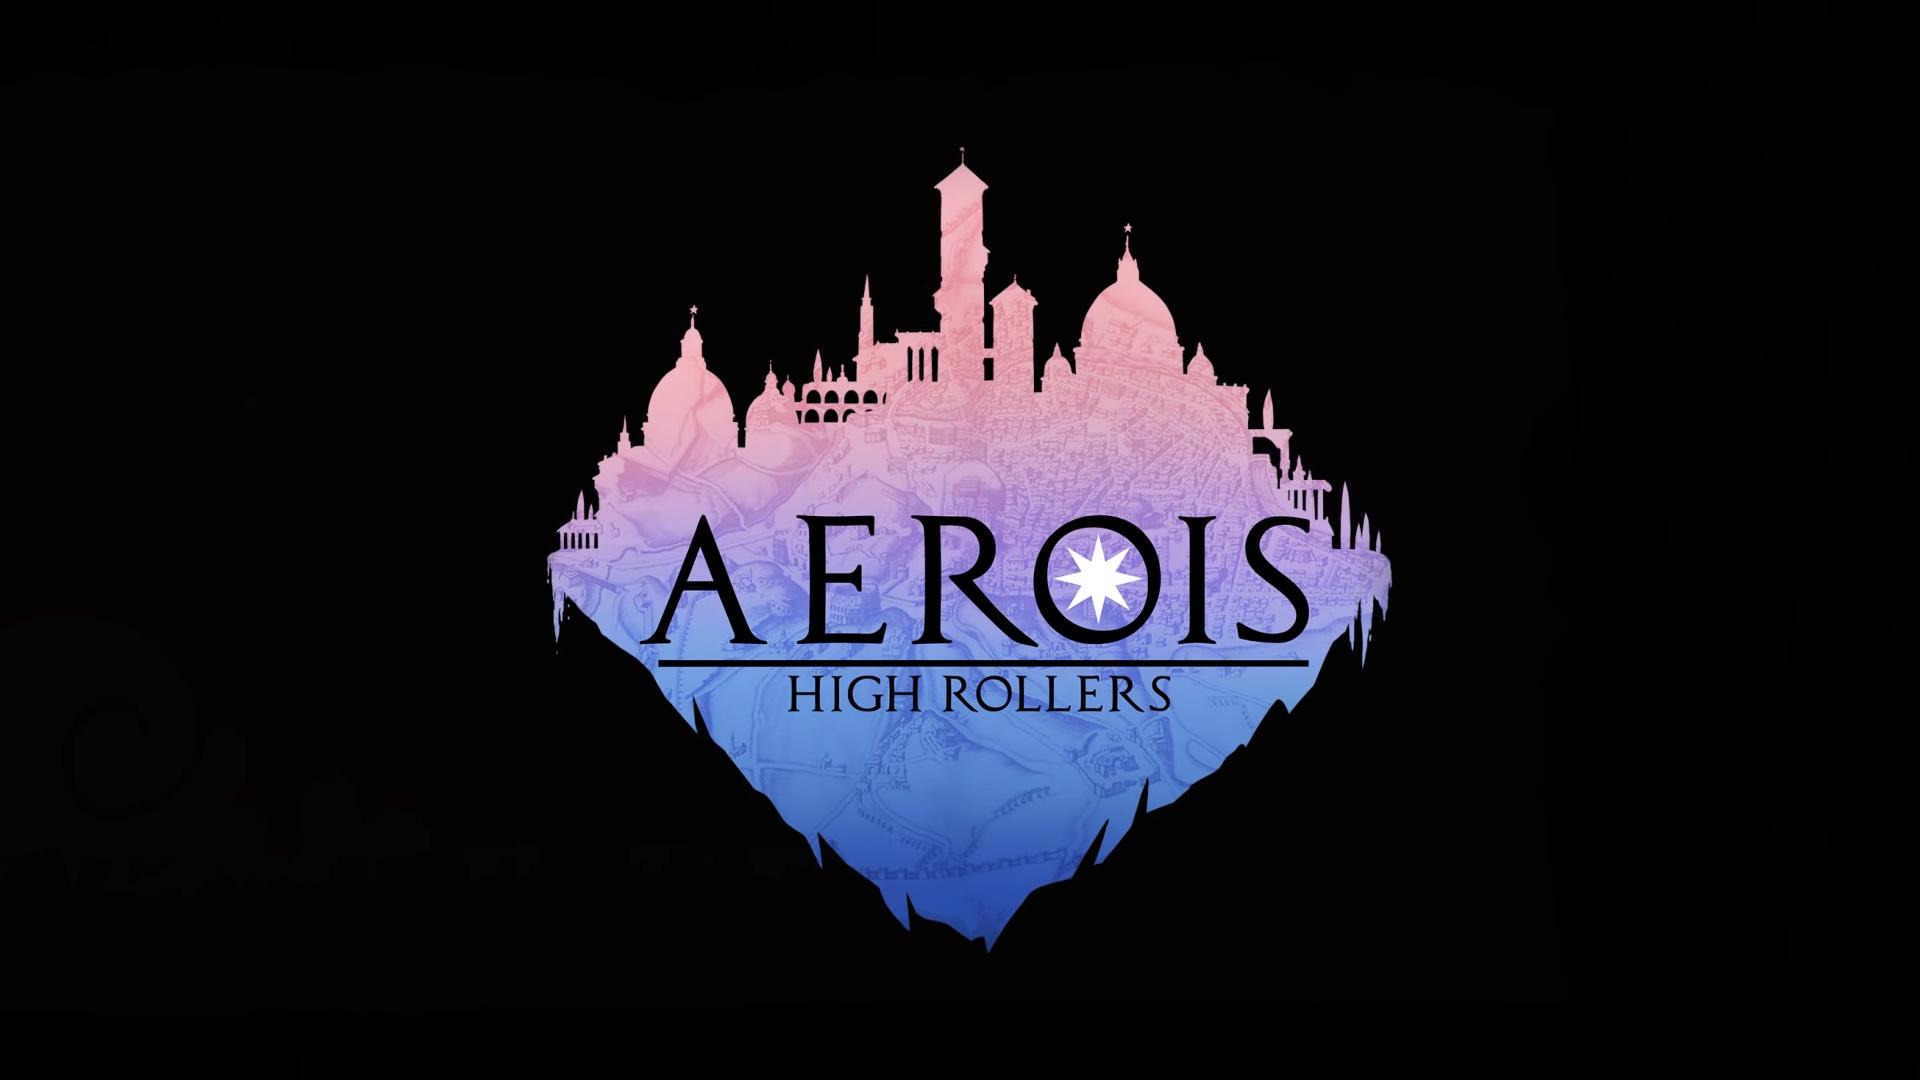 HighRollers: Aerois | Yogscast Wiki | FANDOM powered by Wikia